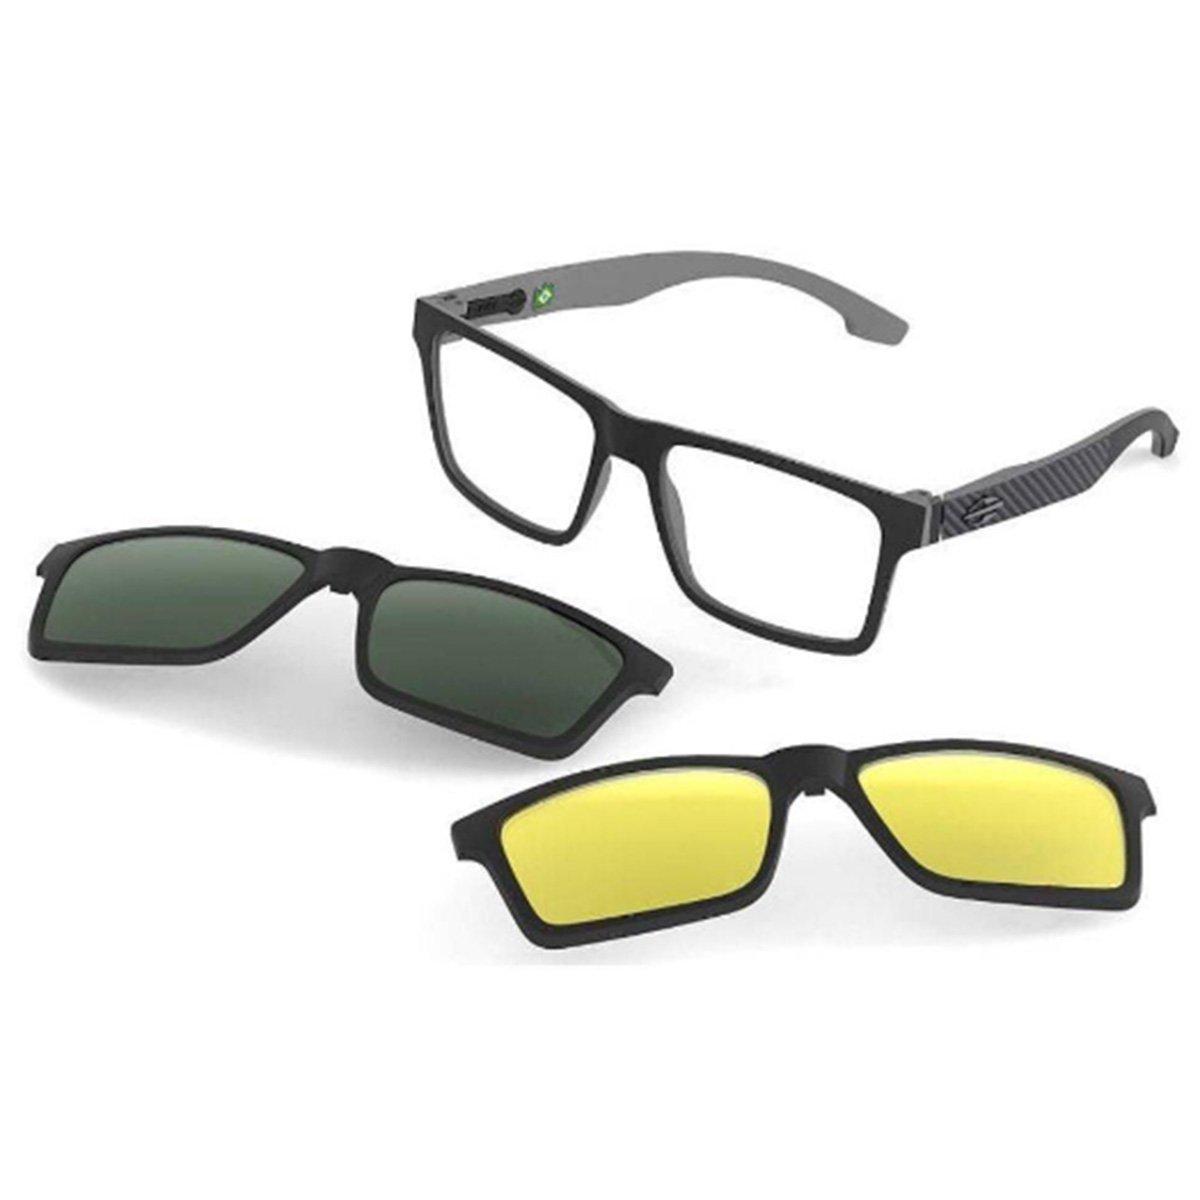 20b4a74165ccd Compre Óculos de Grau Mormaii Swap Clip On em 10X   Tri-Jóia Shop